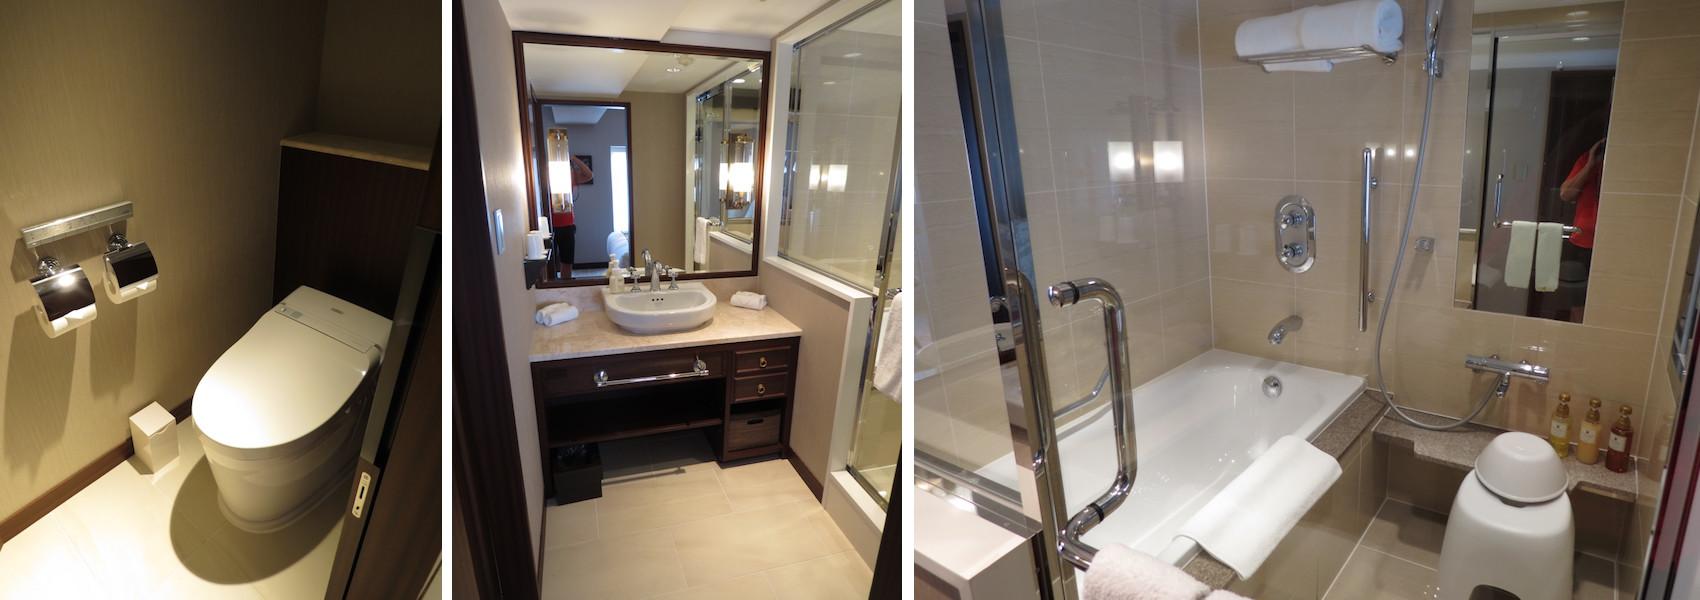 banheiro-kyoto-century-hotel